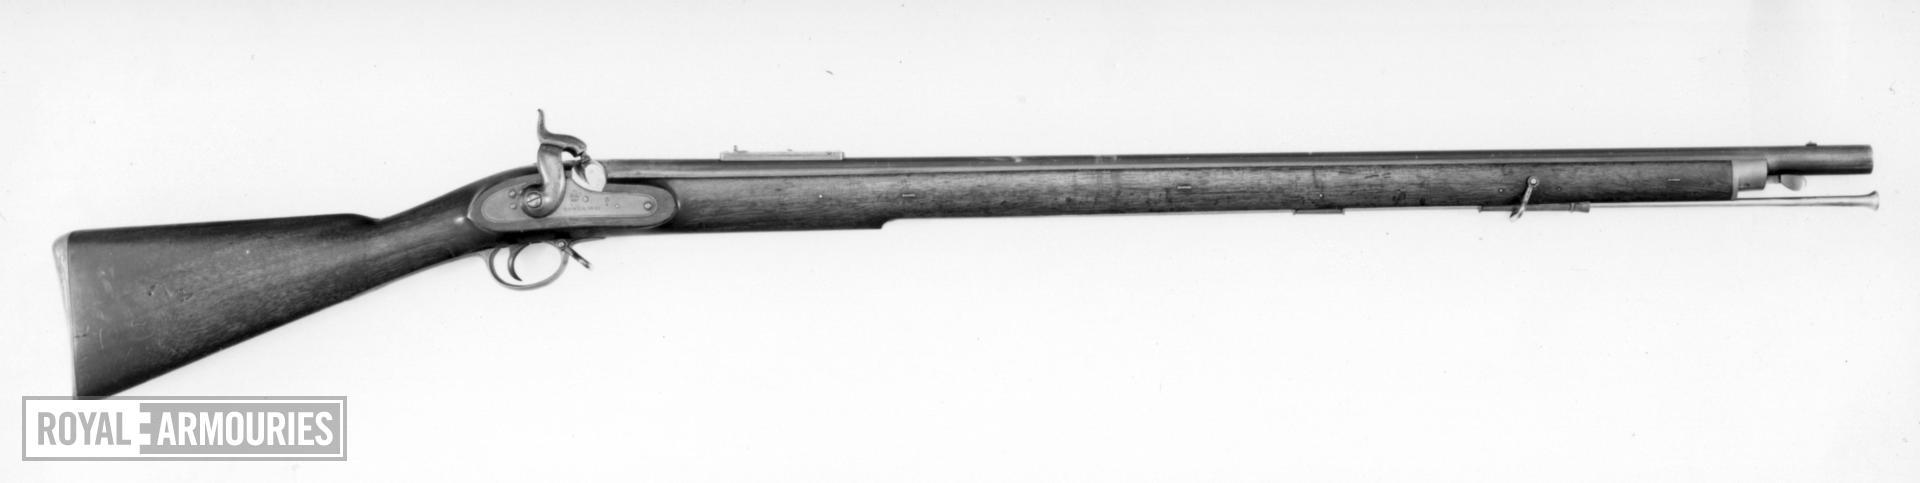 Percussion muzzle-loading military musket - Pattern 1842